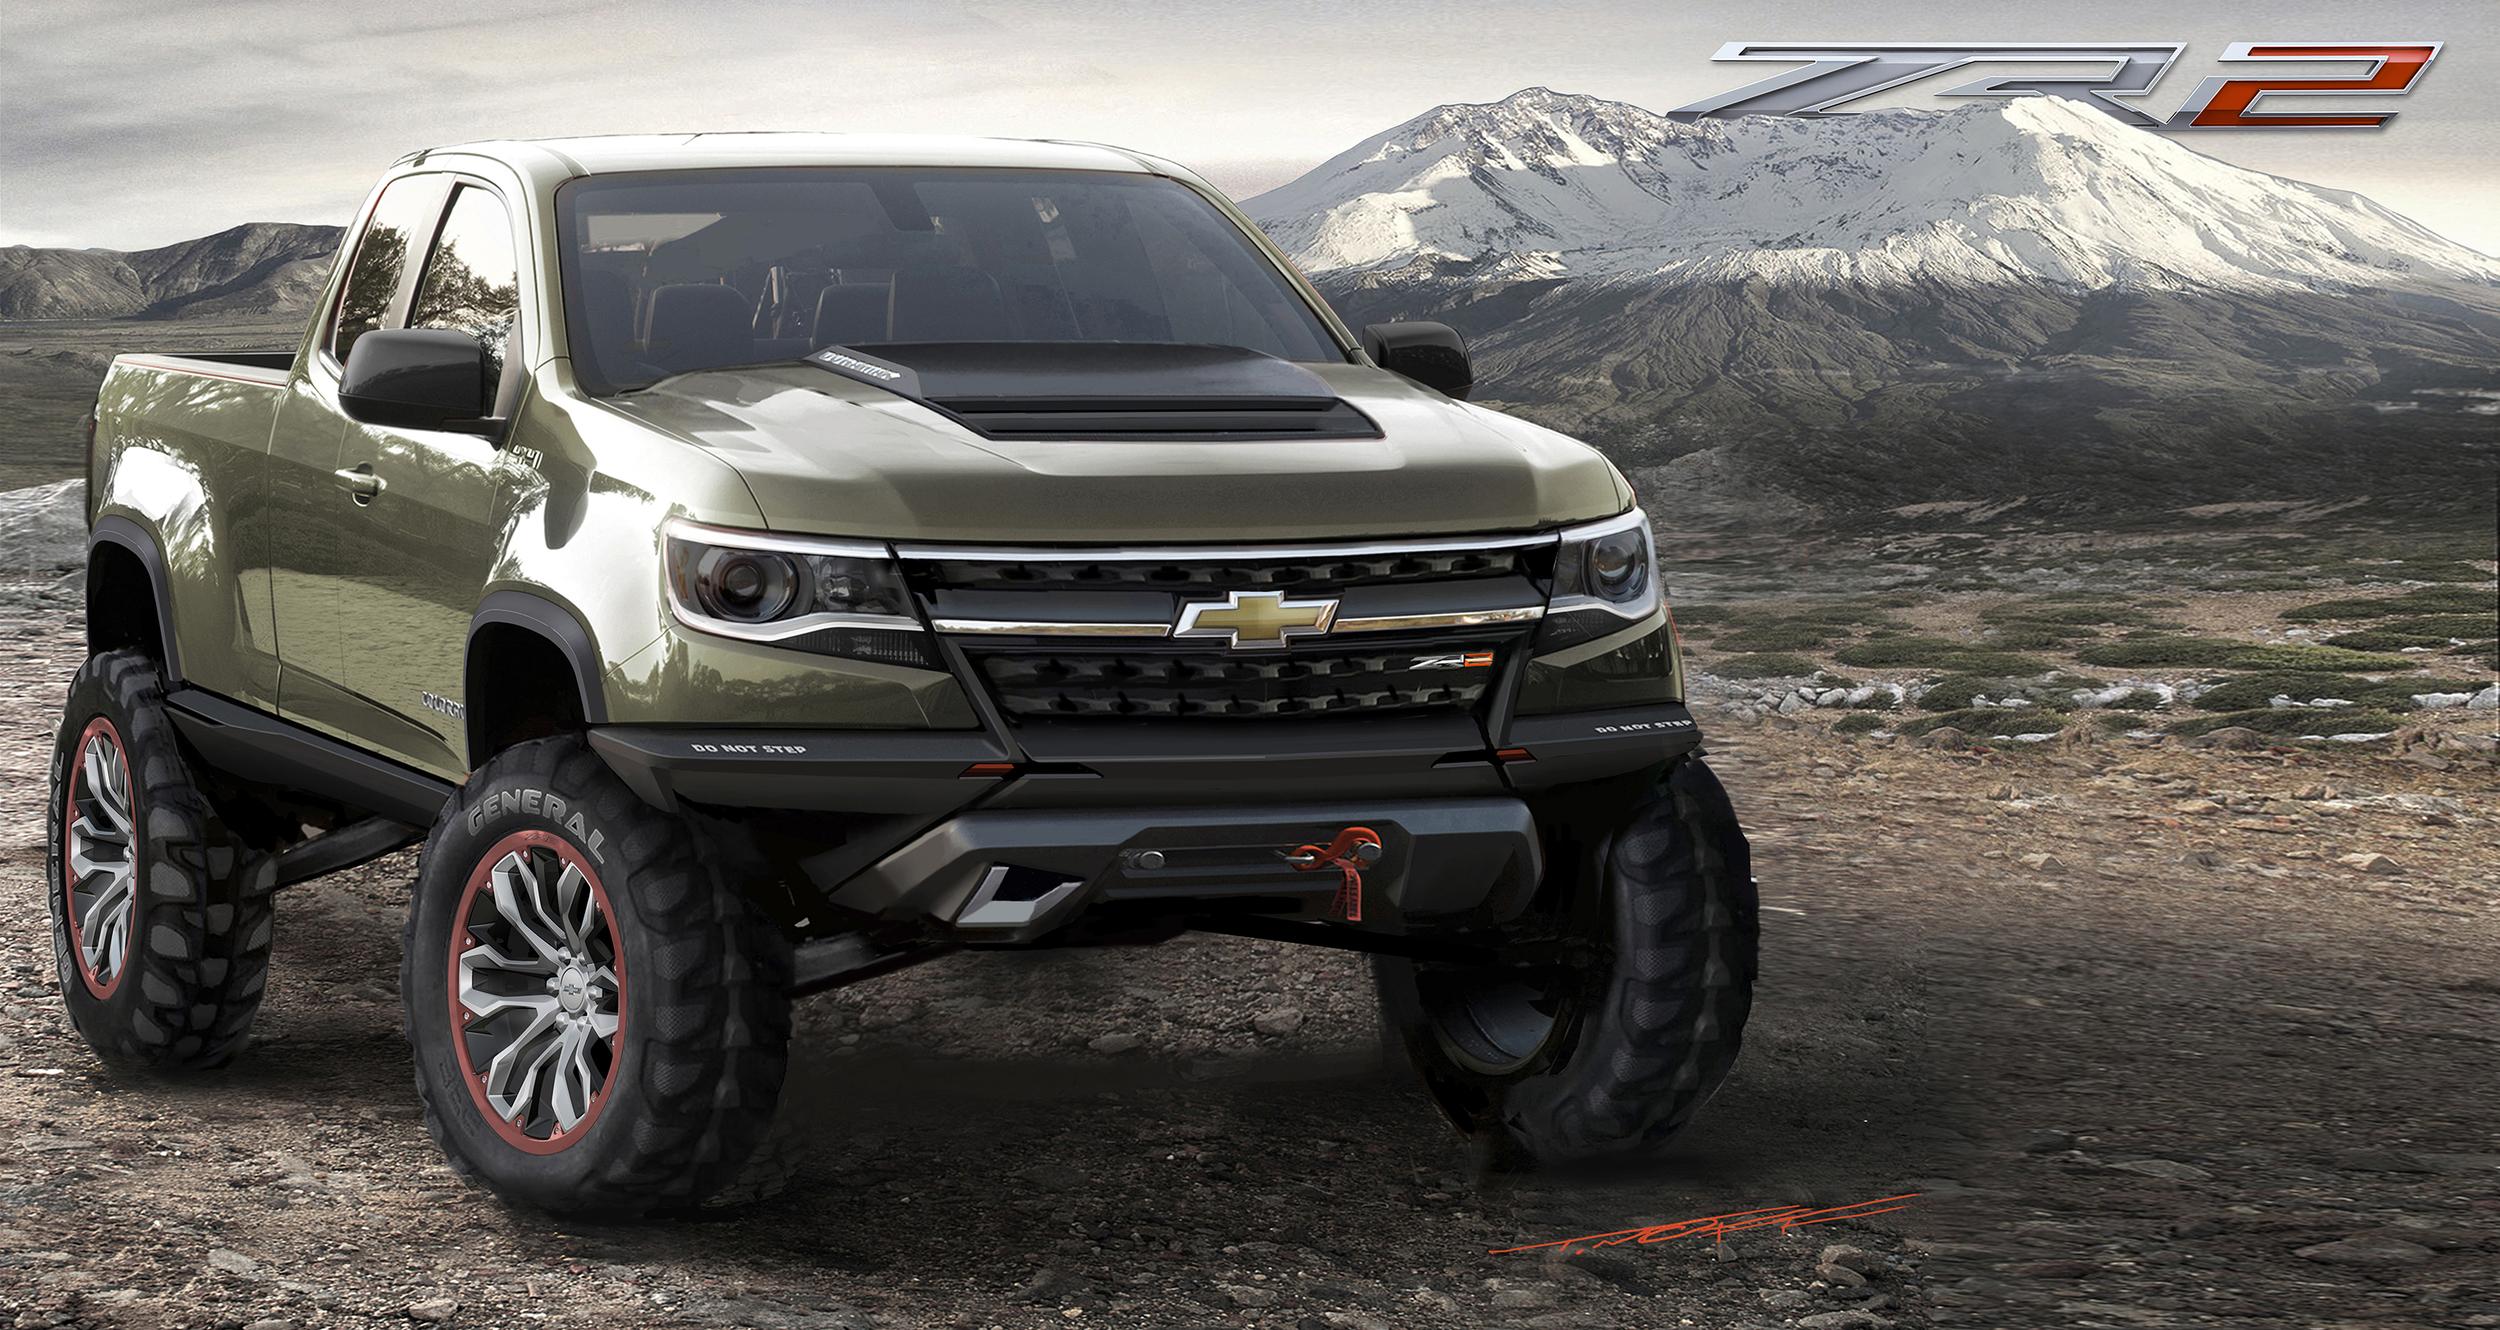 2015 chevrolet colorado zr2 concept truck rocks 2014 la auto show. Black Bedroom Furniture Sets. Home Design Ideas